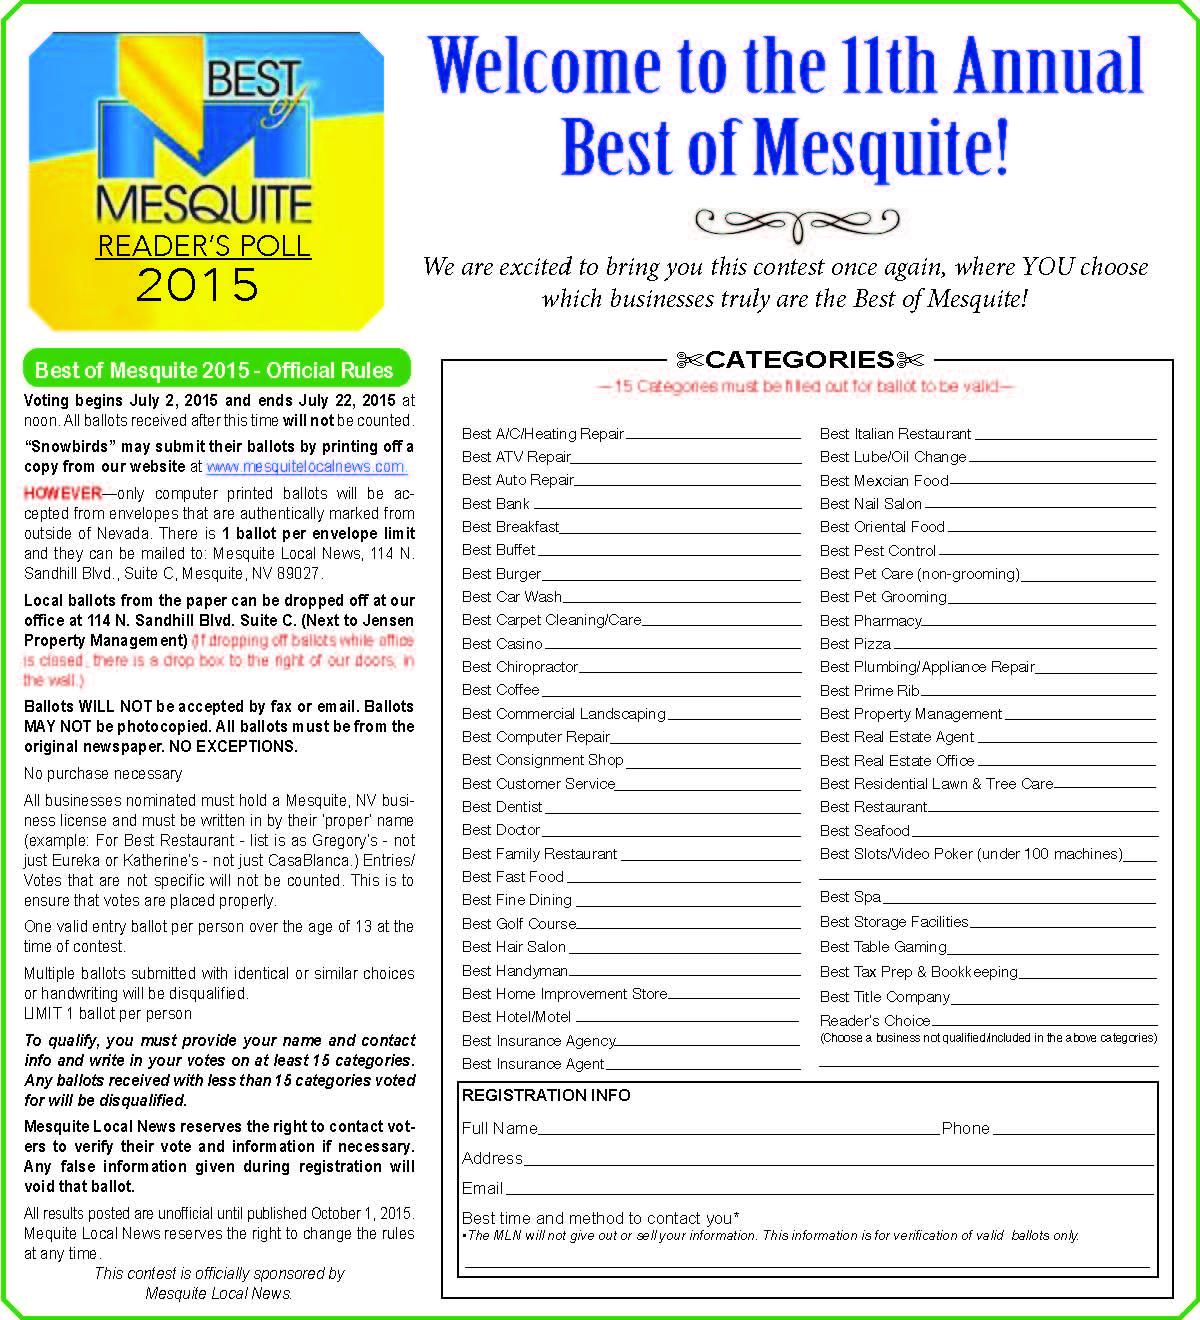 Best of Mesquite 2015 Ballot